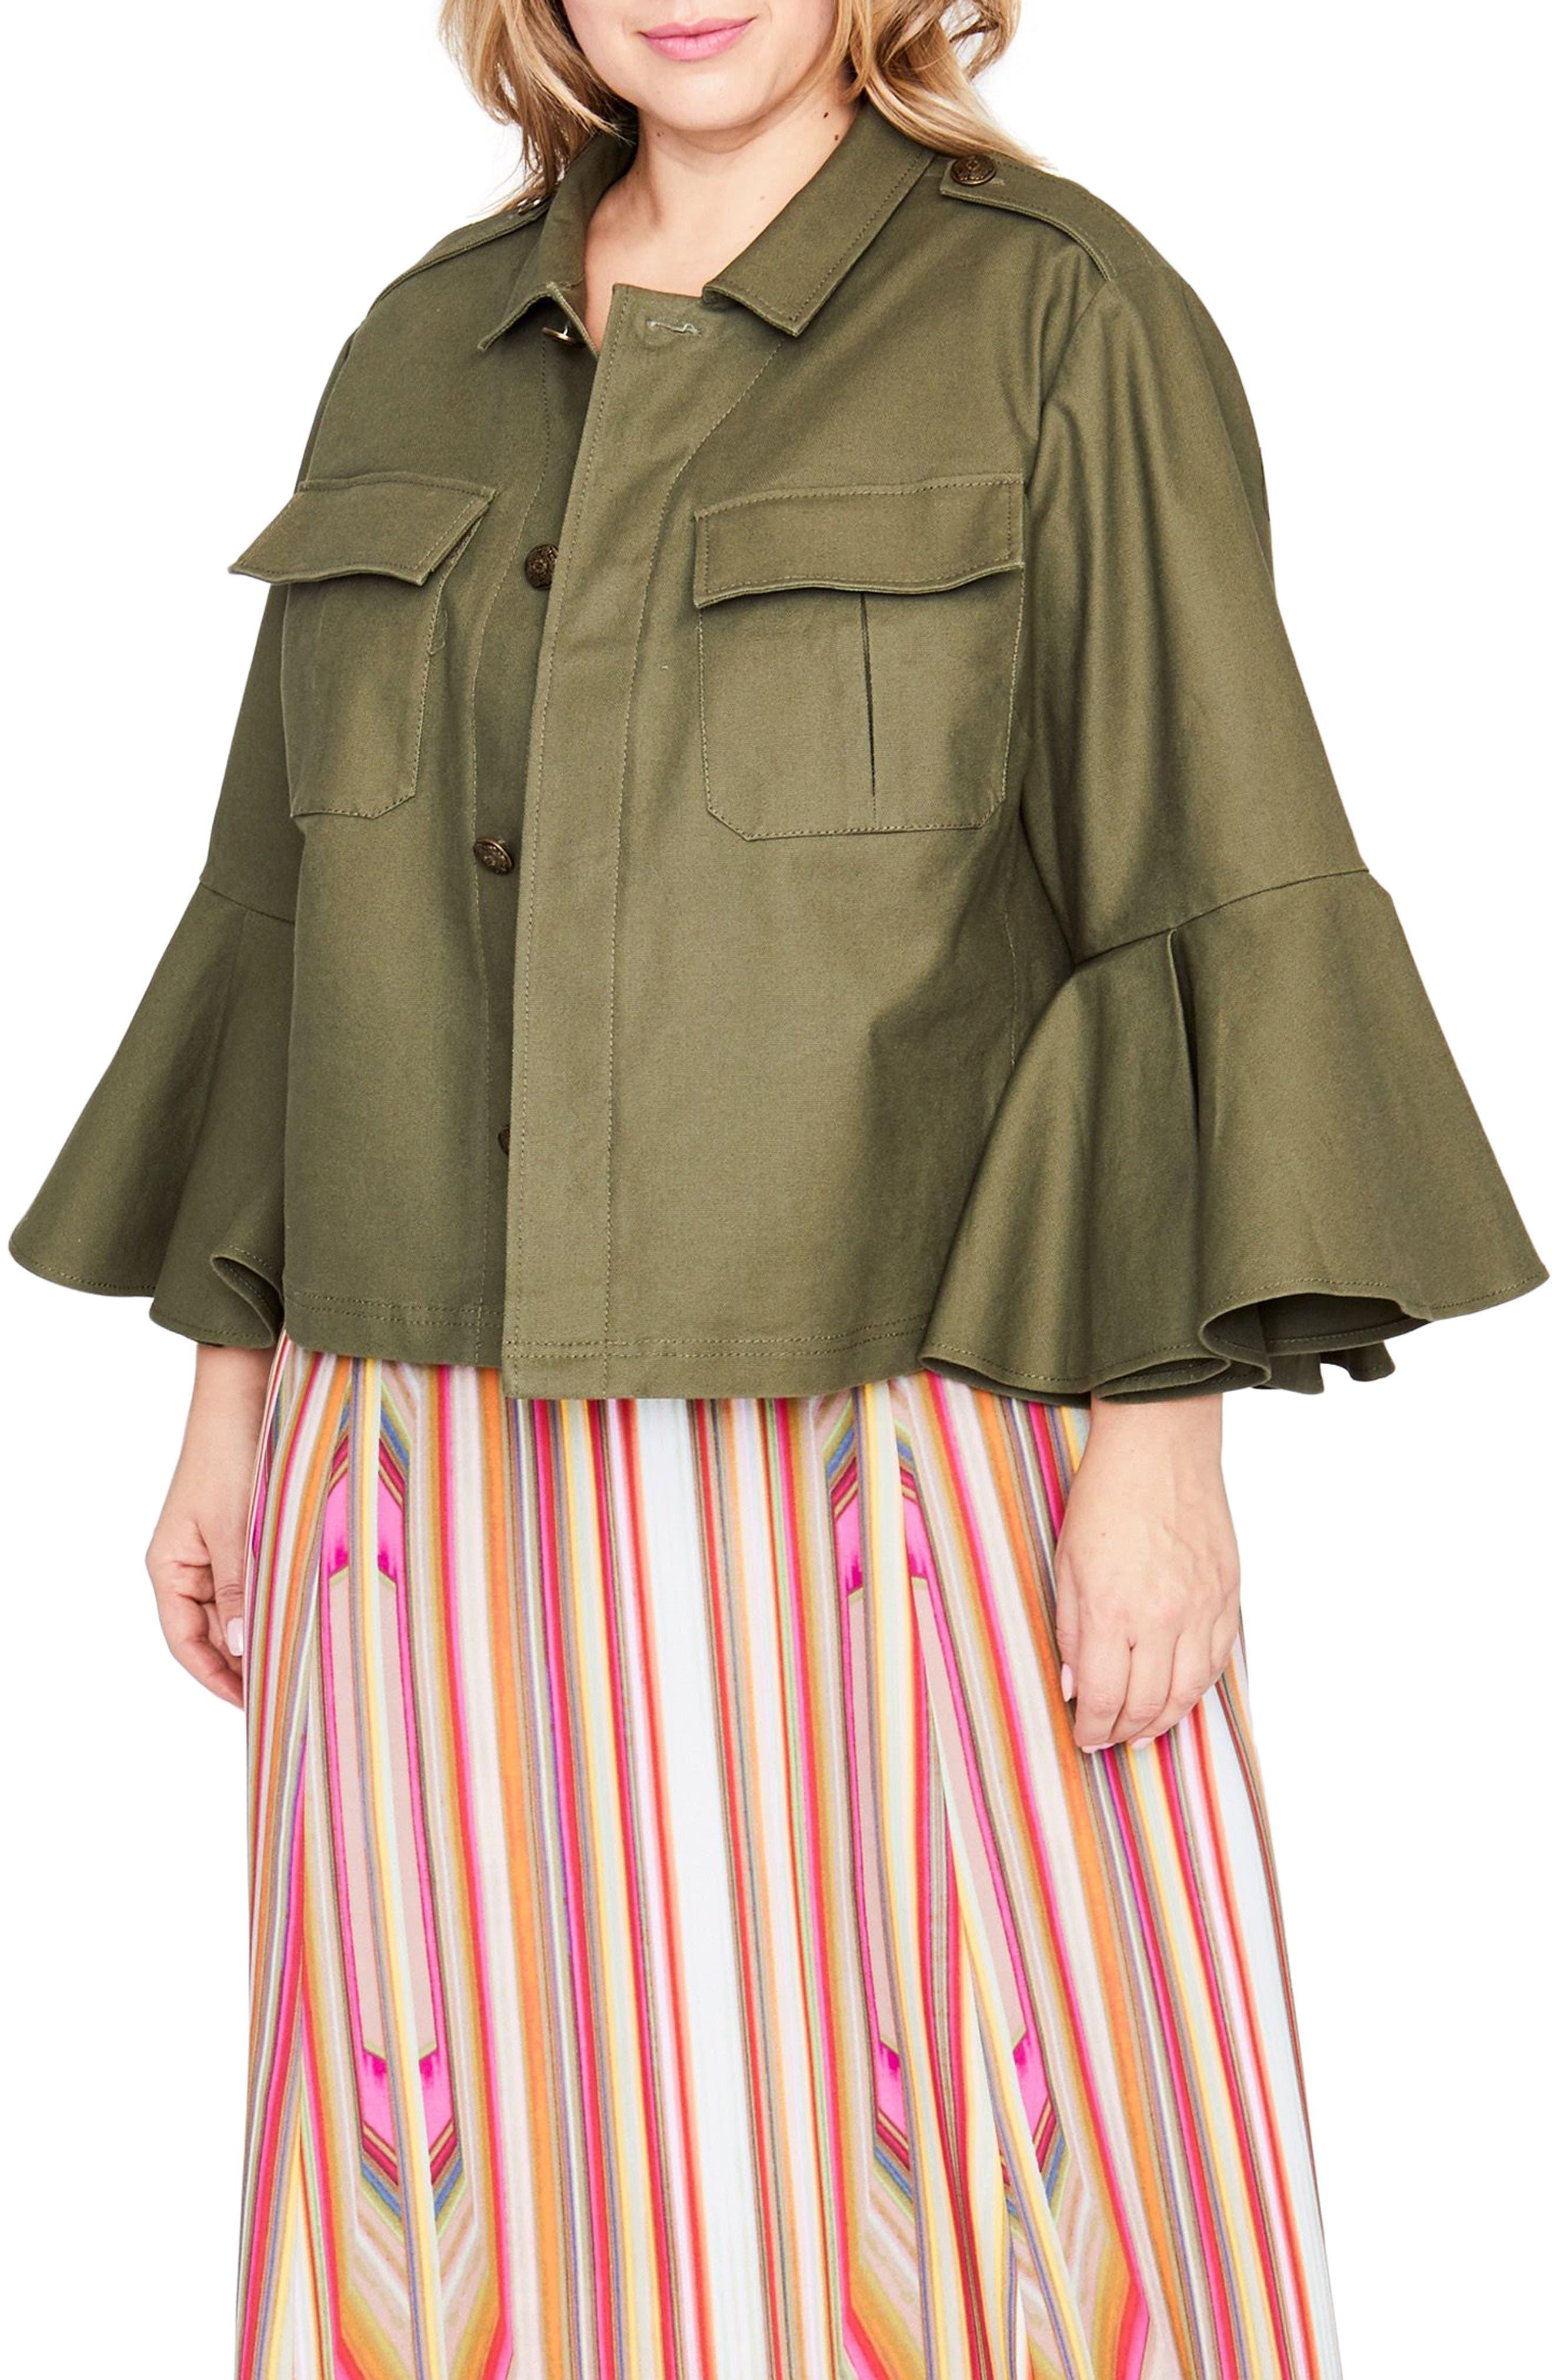 Ruffle Sleeve Utility Jacket,                             Main thumbnail 1, color,                             Army Green